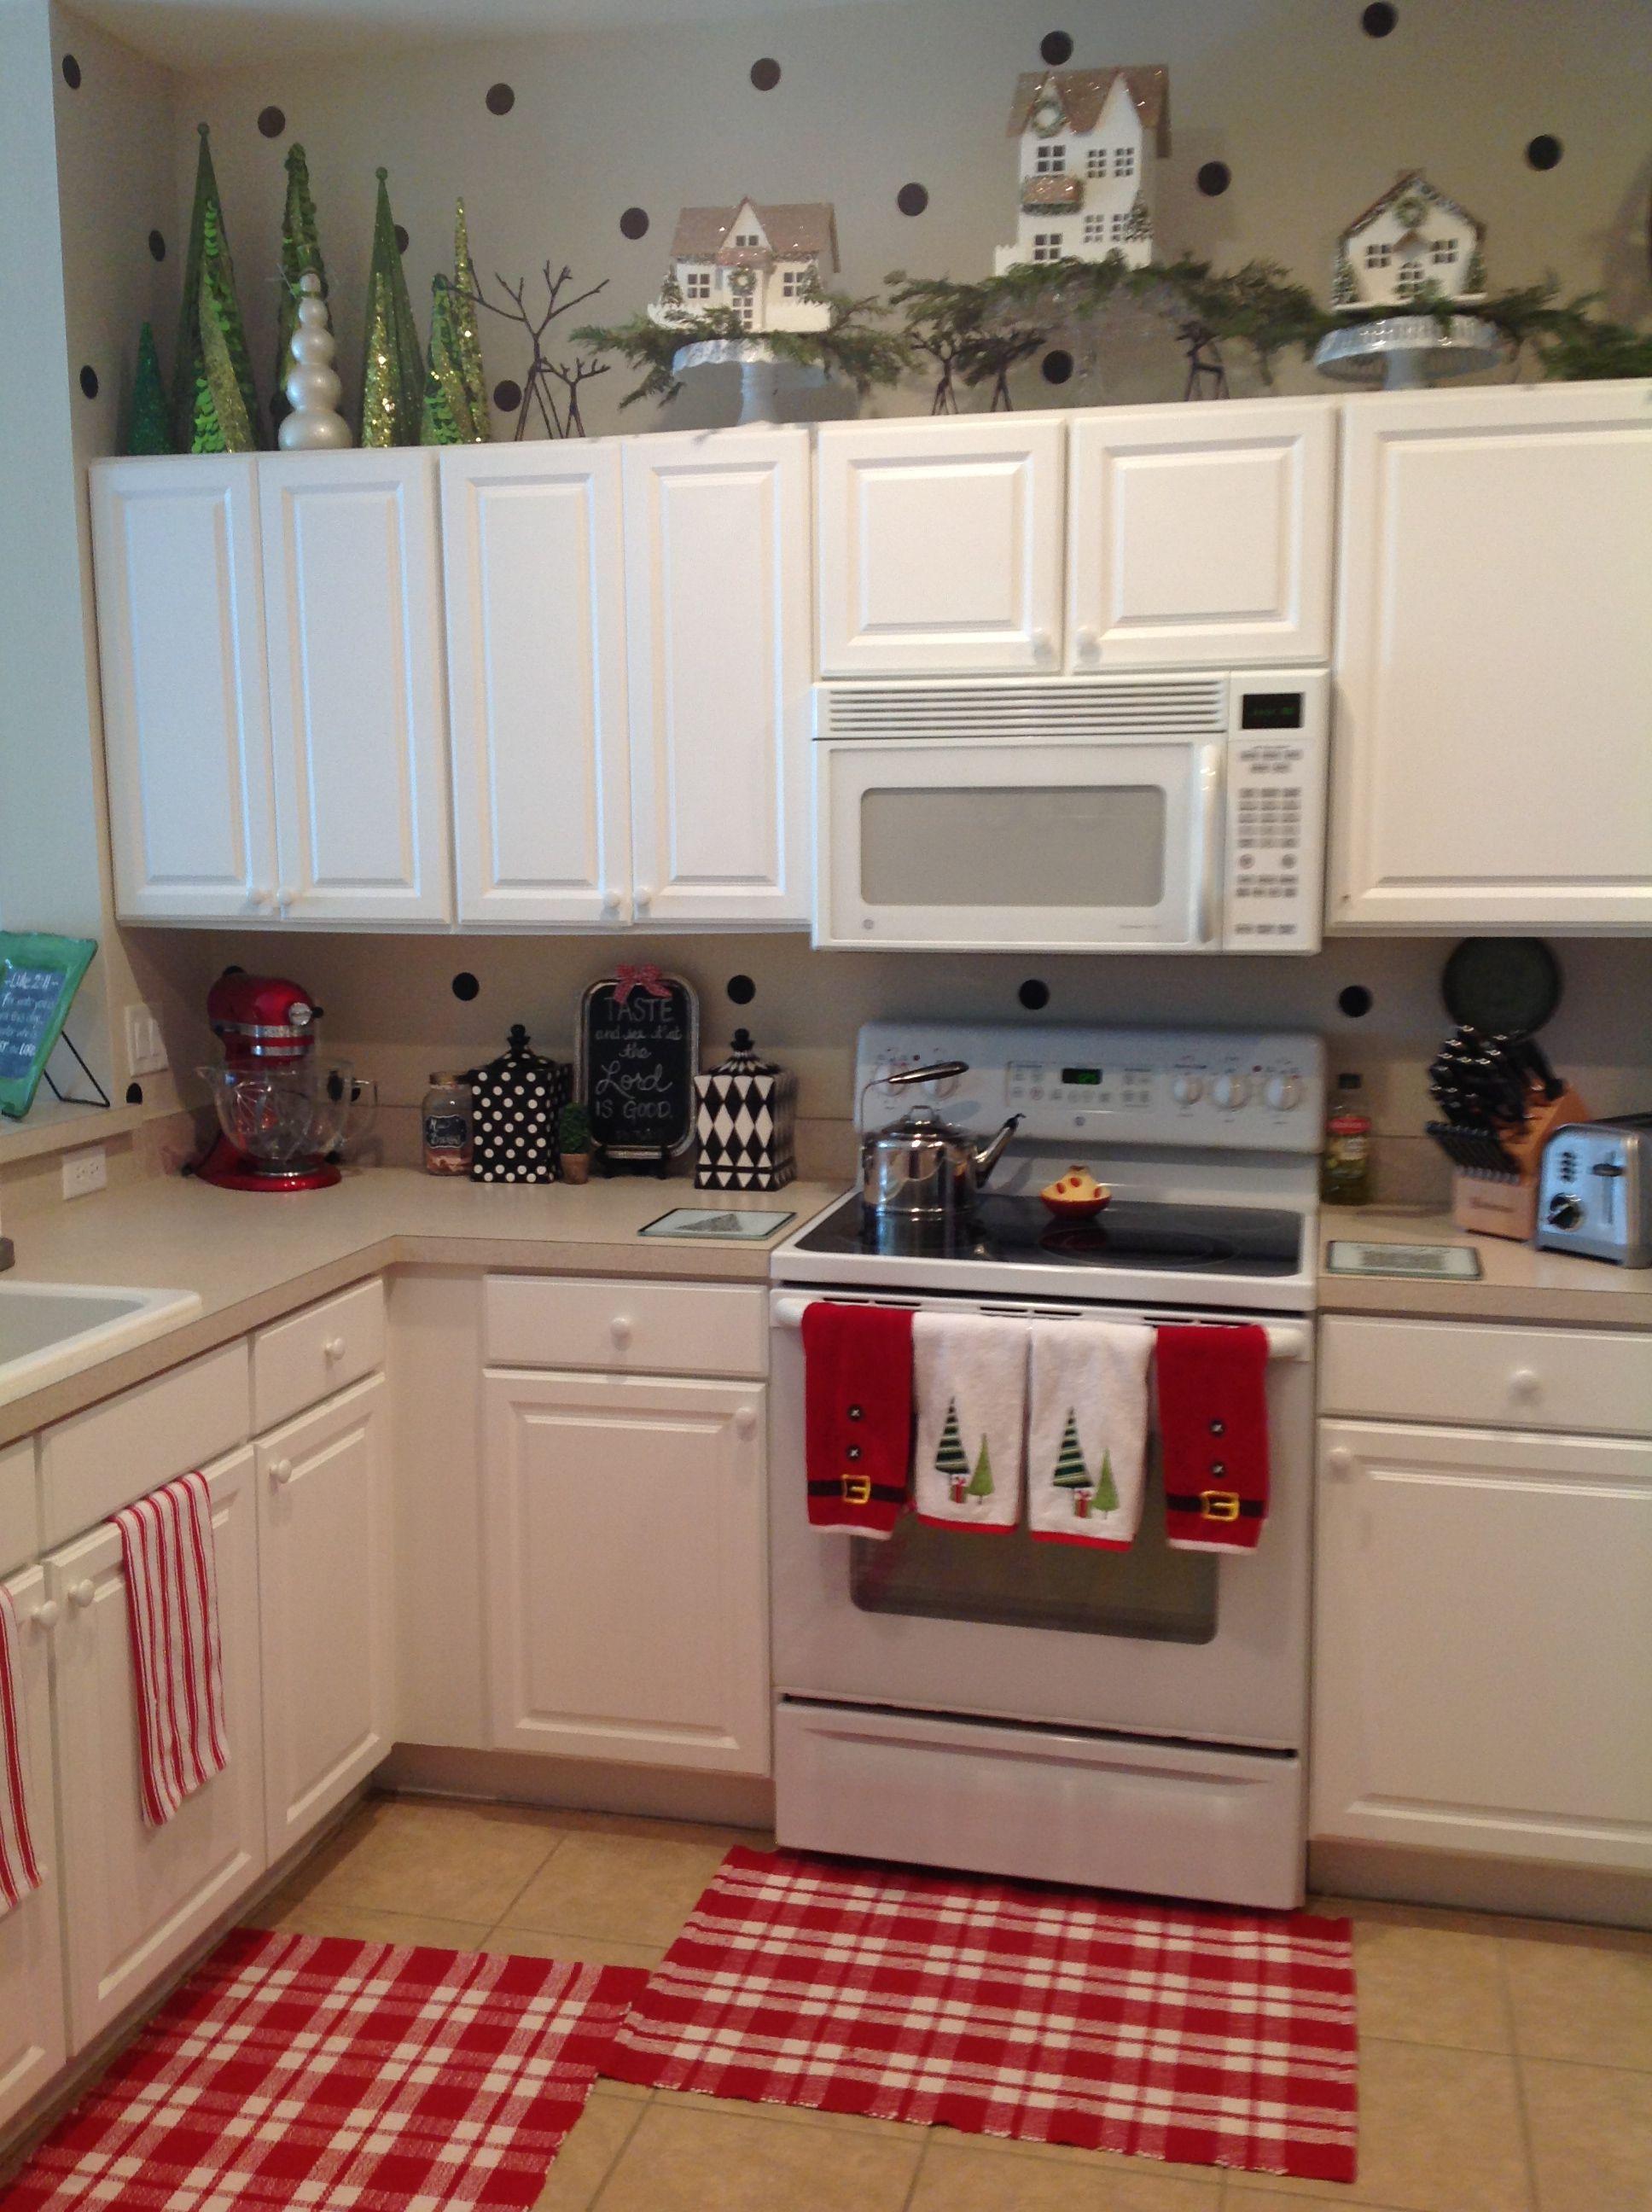 My friend Danielle's Christmas kitchen.... With polka dot walls!!:)